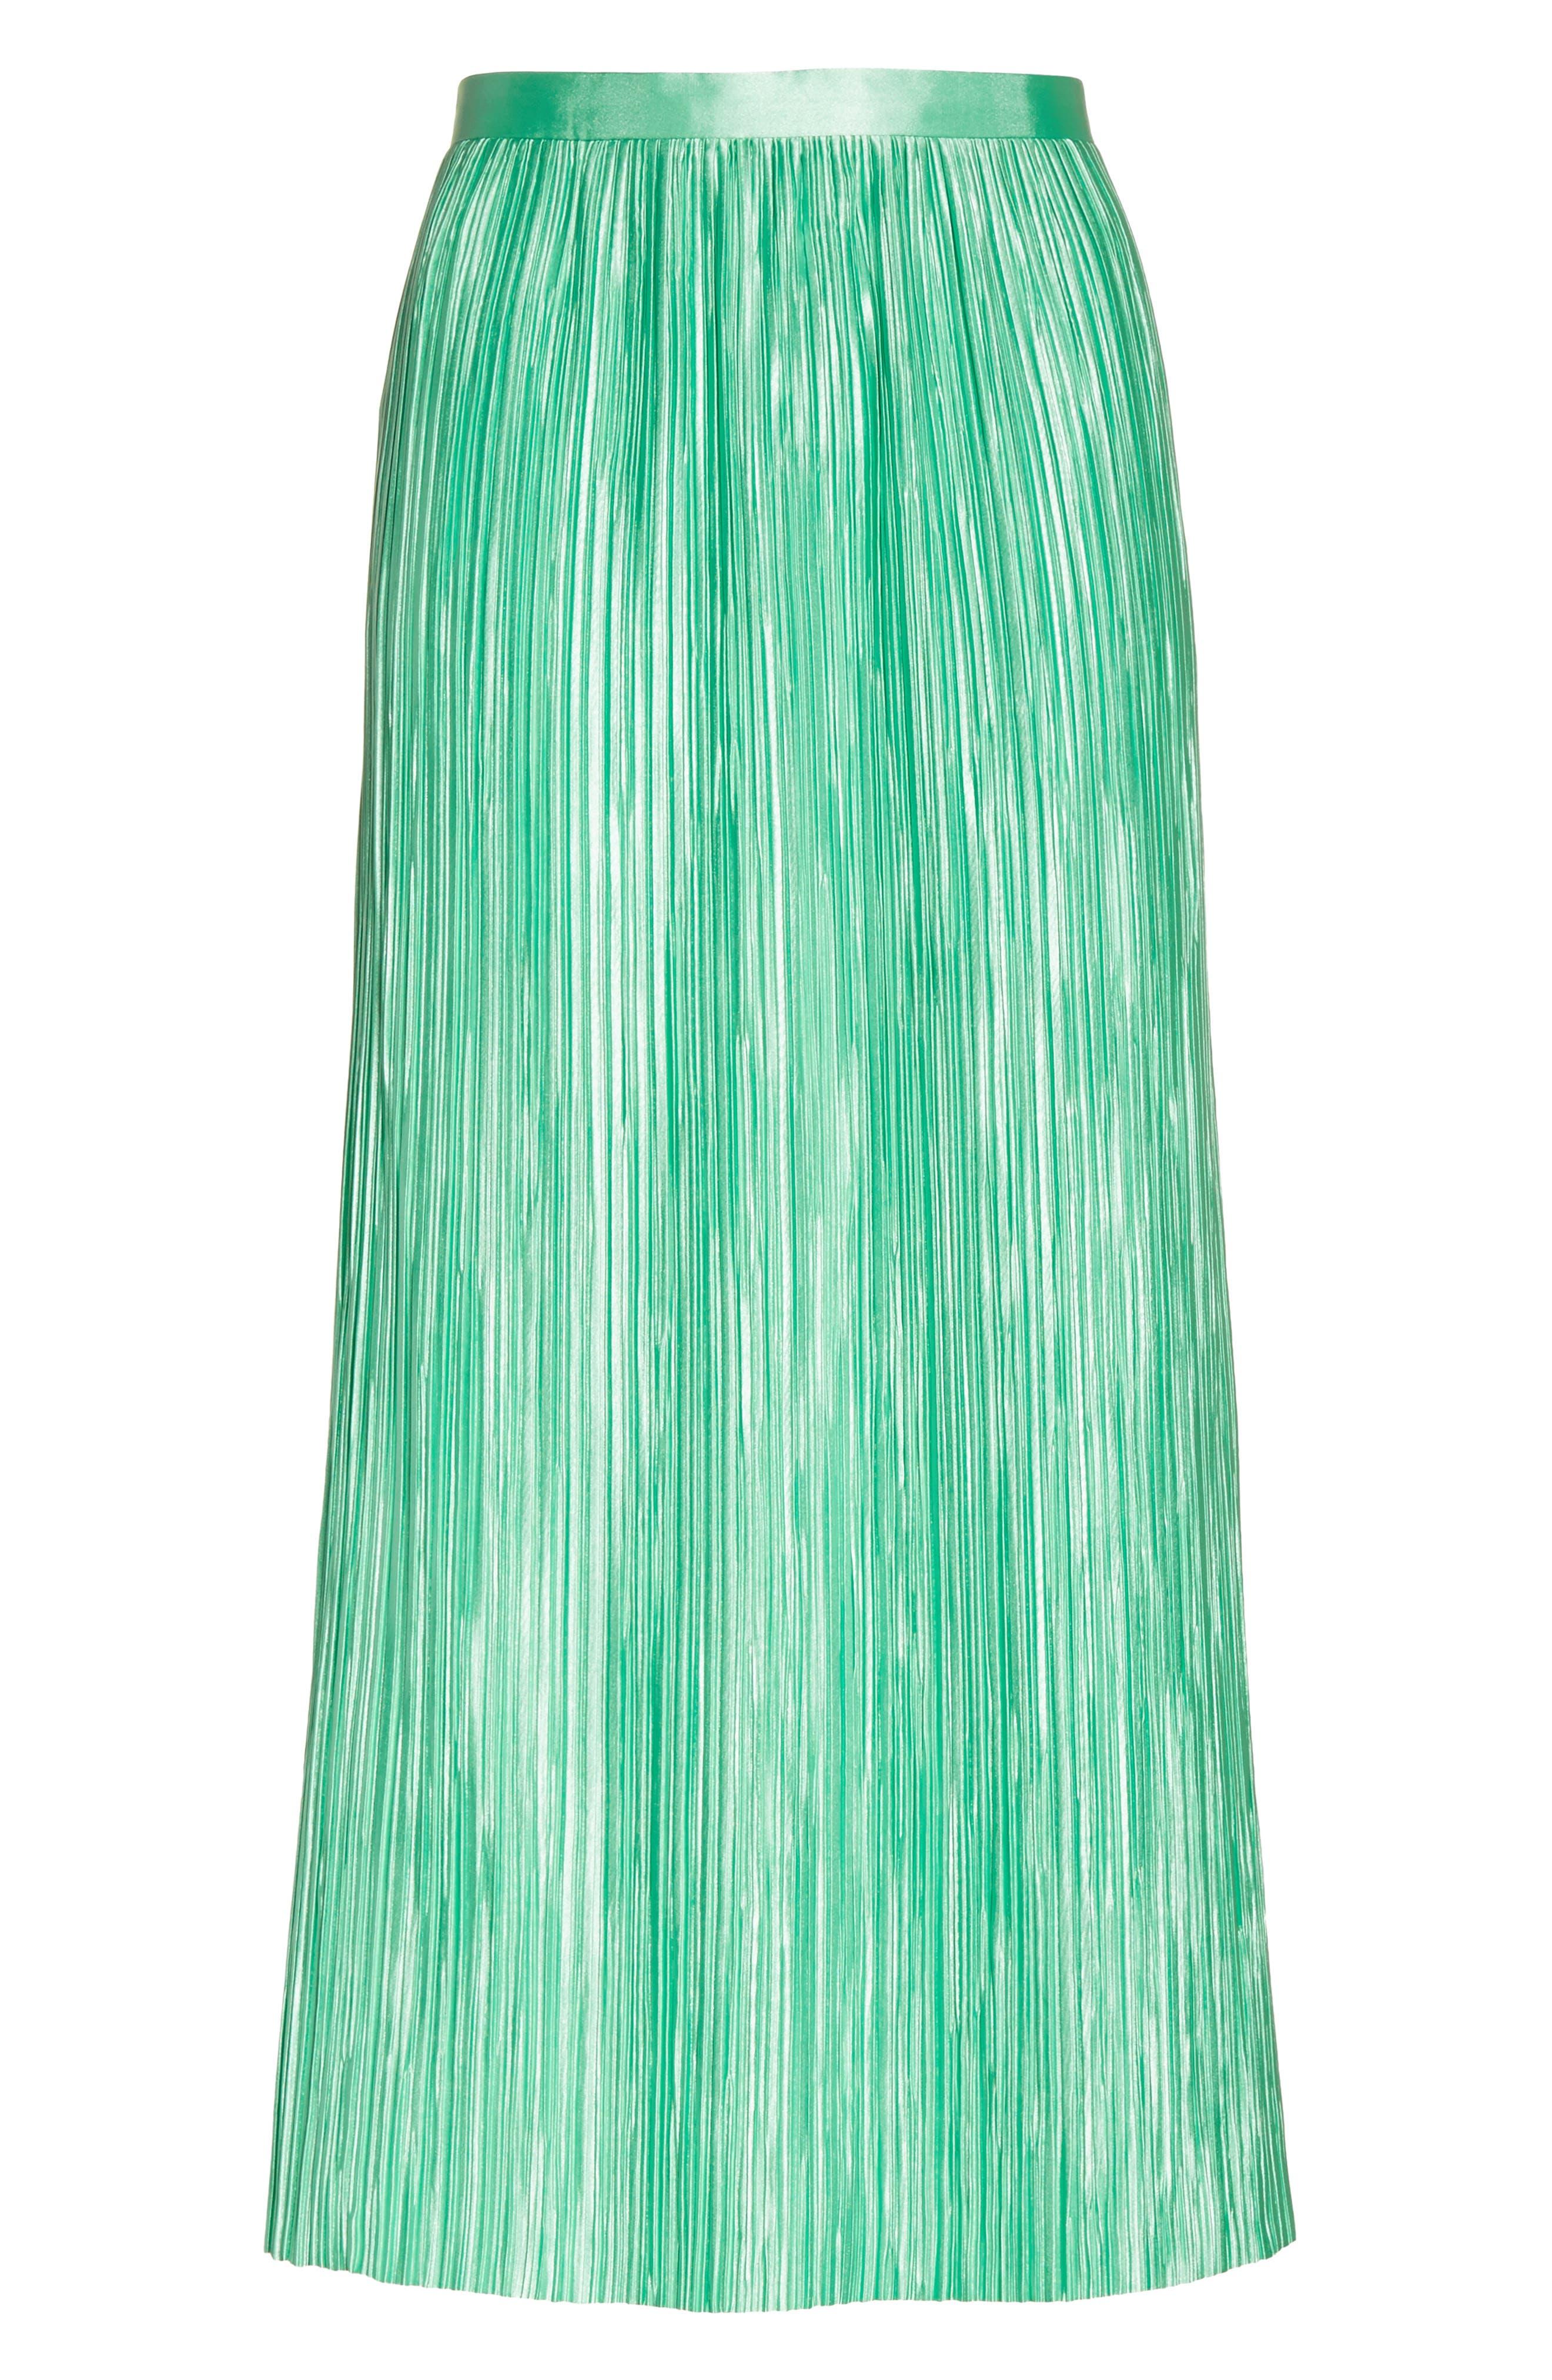 Plissé Pleated Midi Skirt,                             Alternate thumbnail 6, color,                             Kelly Green